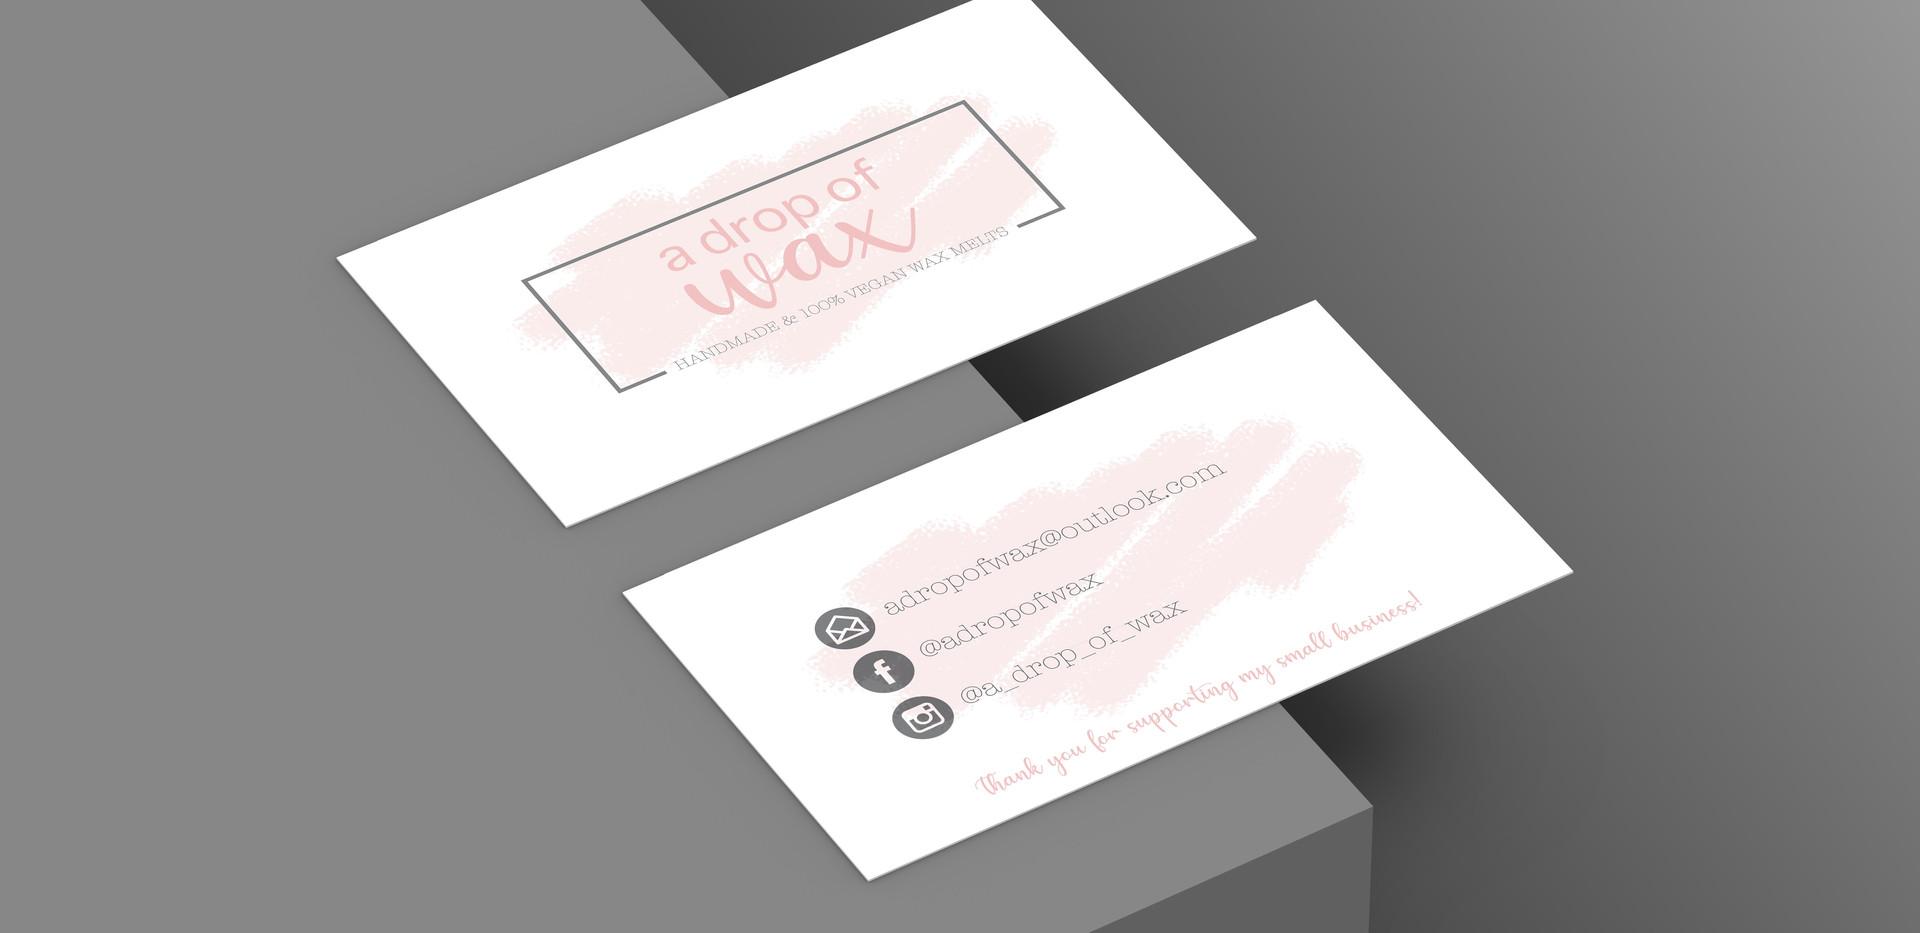 A Drop of Wax Business Card design mockup